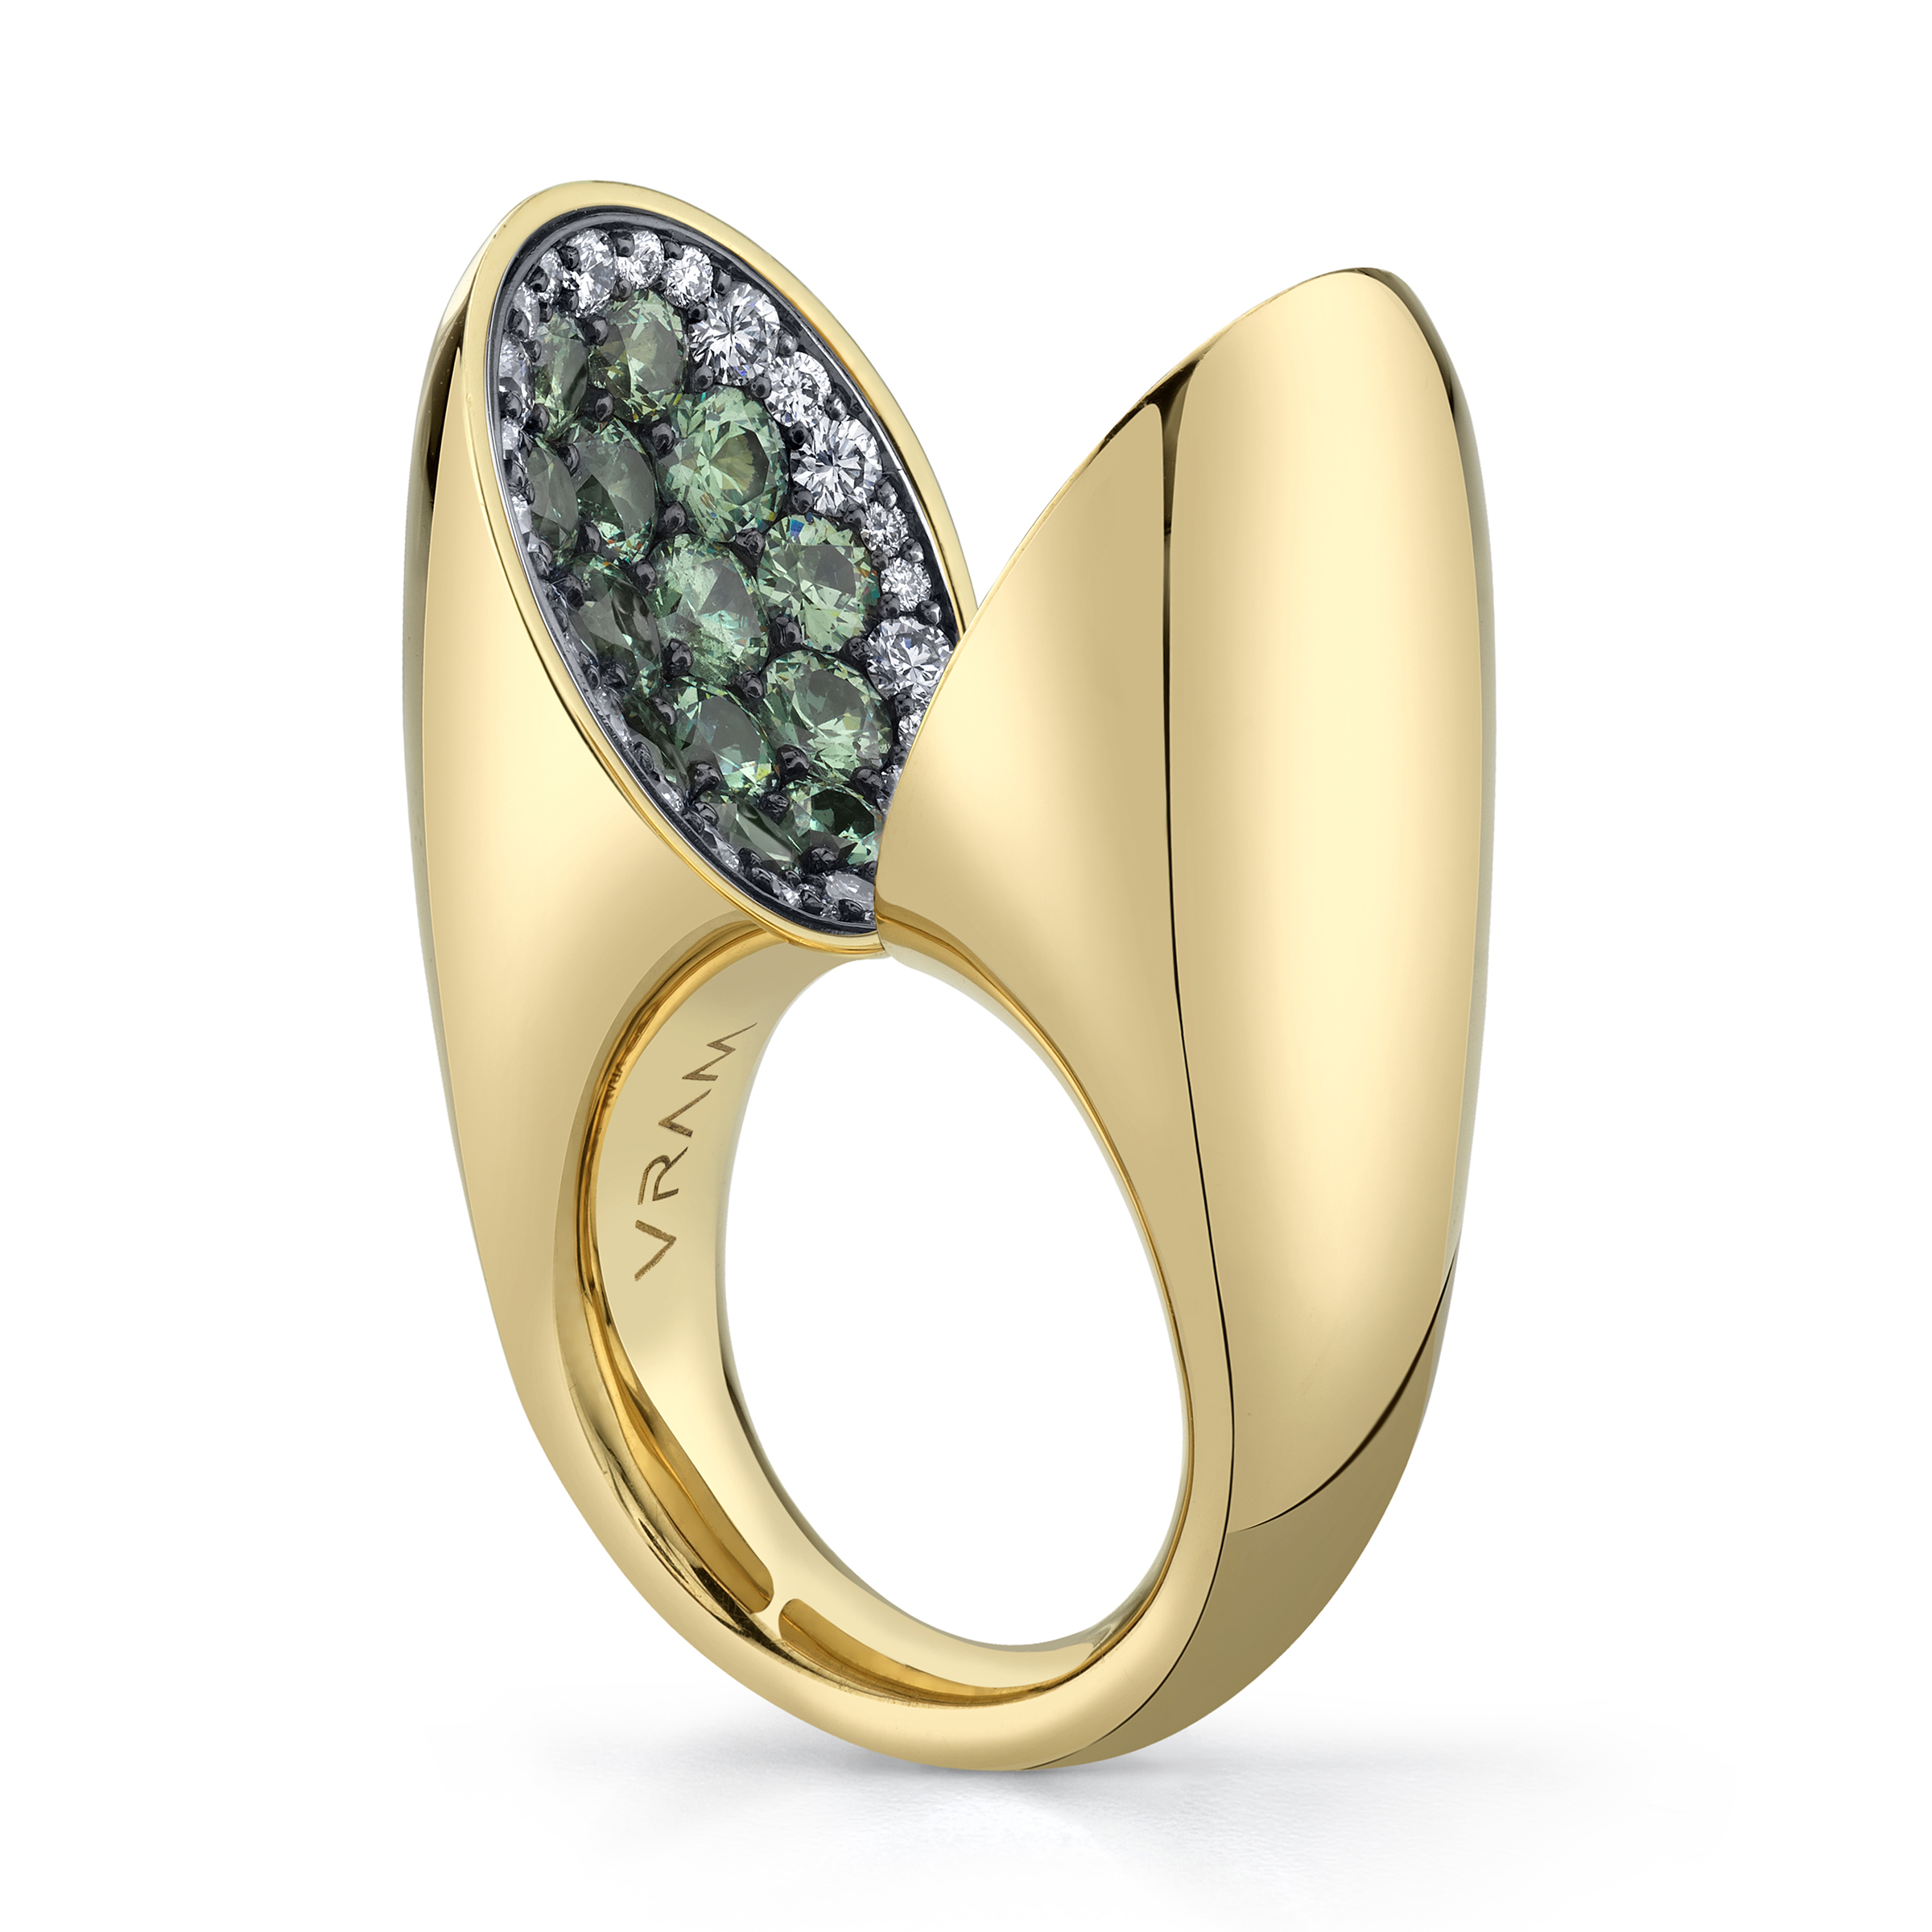 VRAM Echo Ring With Diamonds and Demantoid Garnets 2.jpg